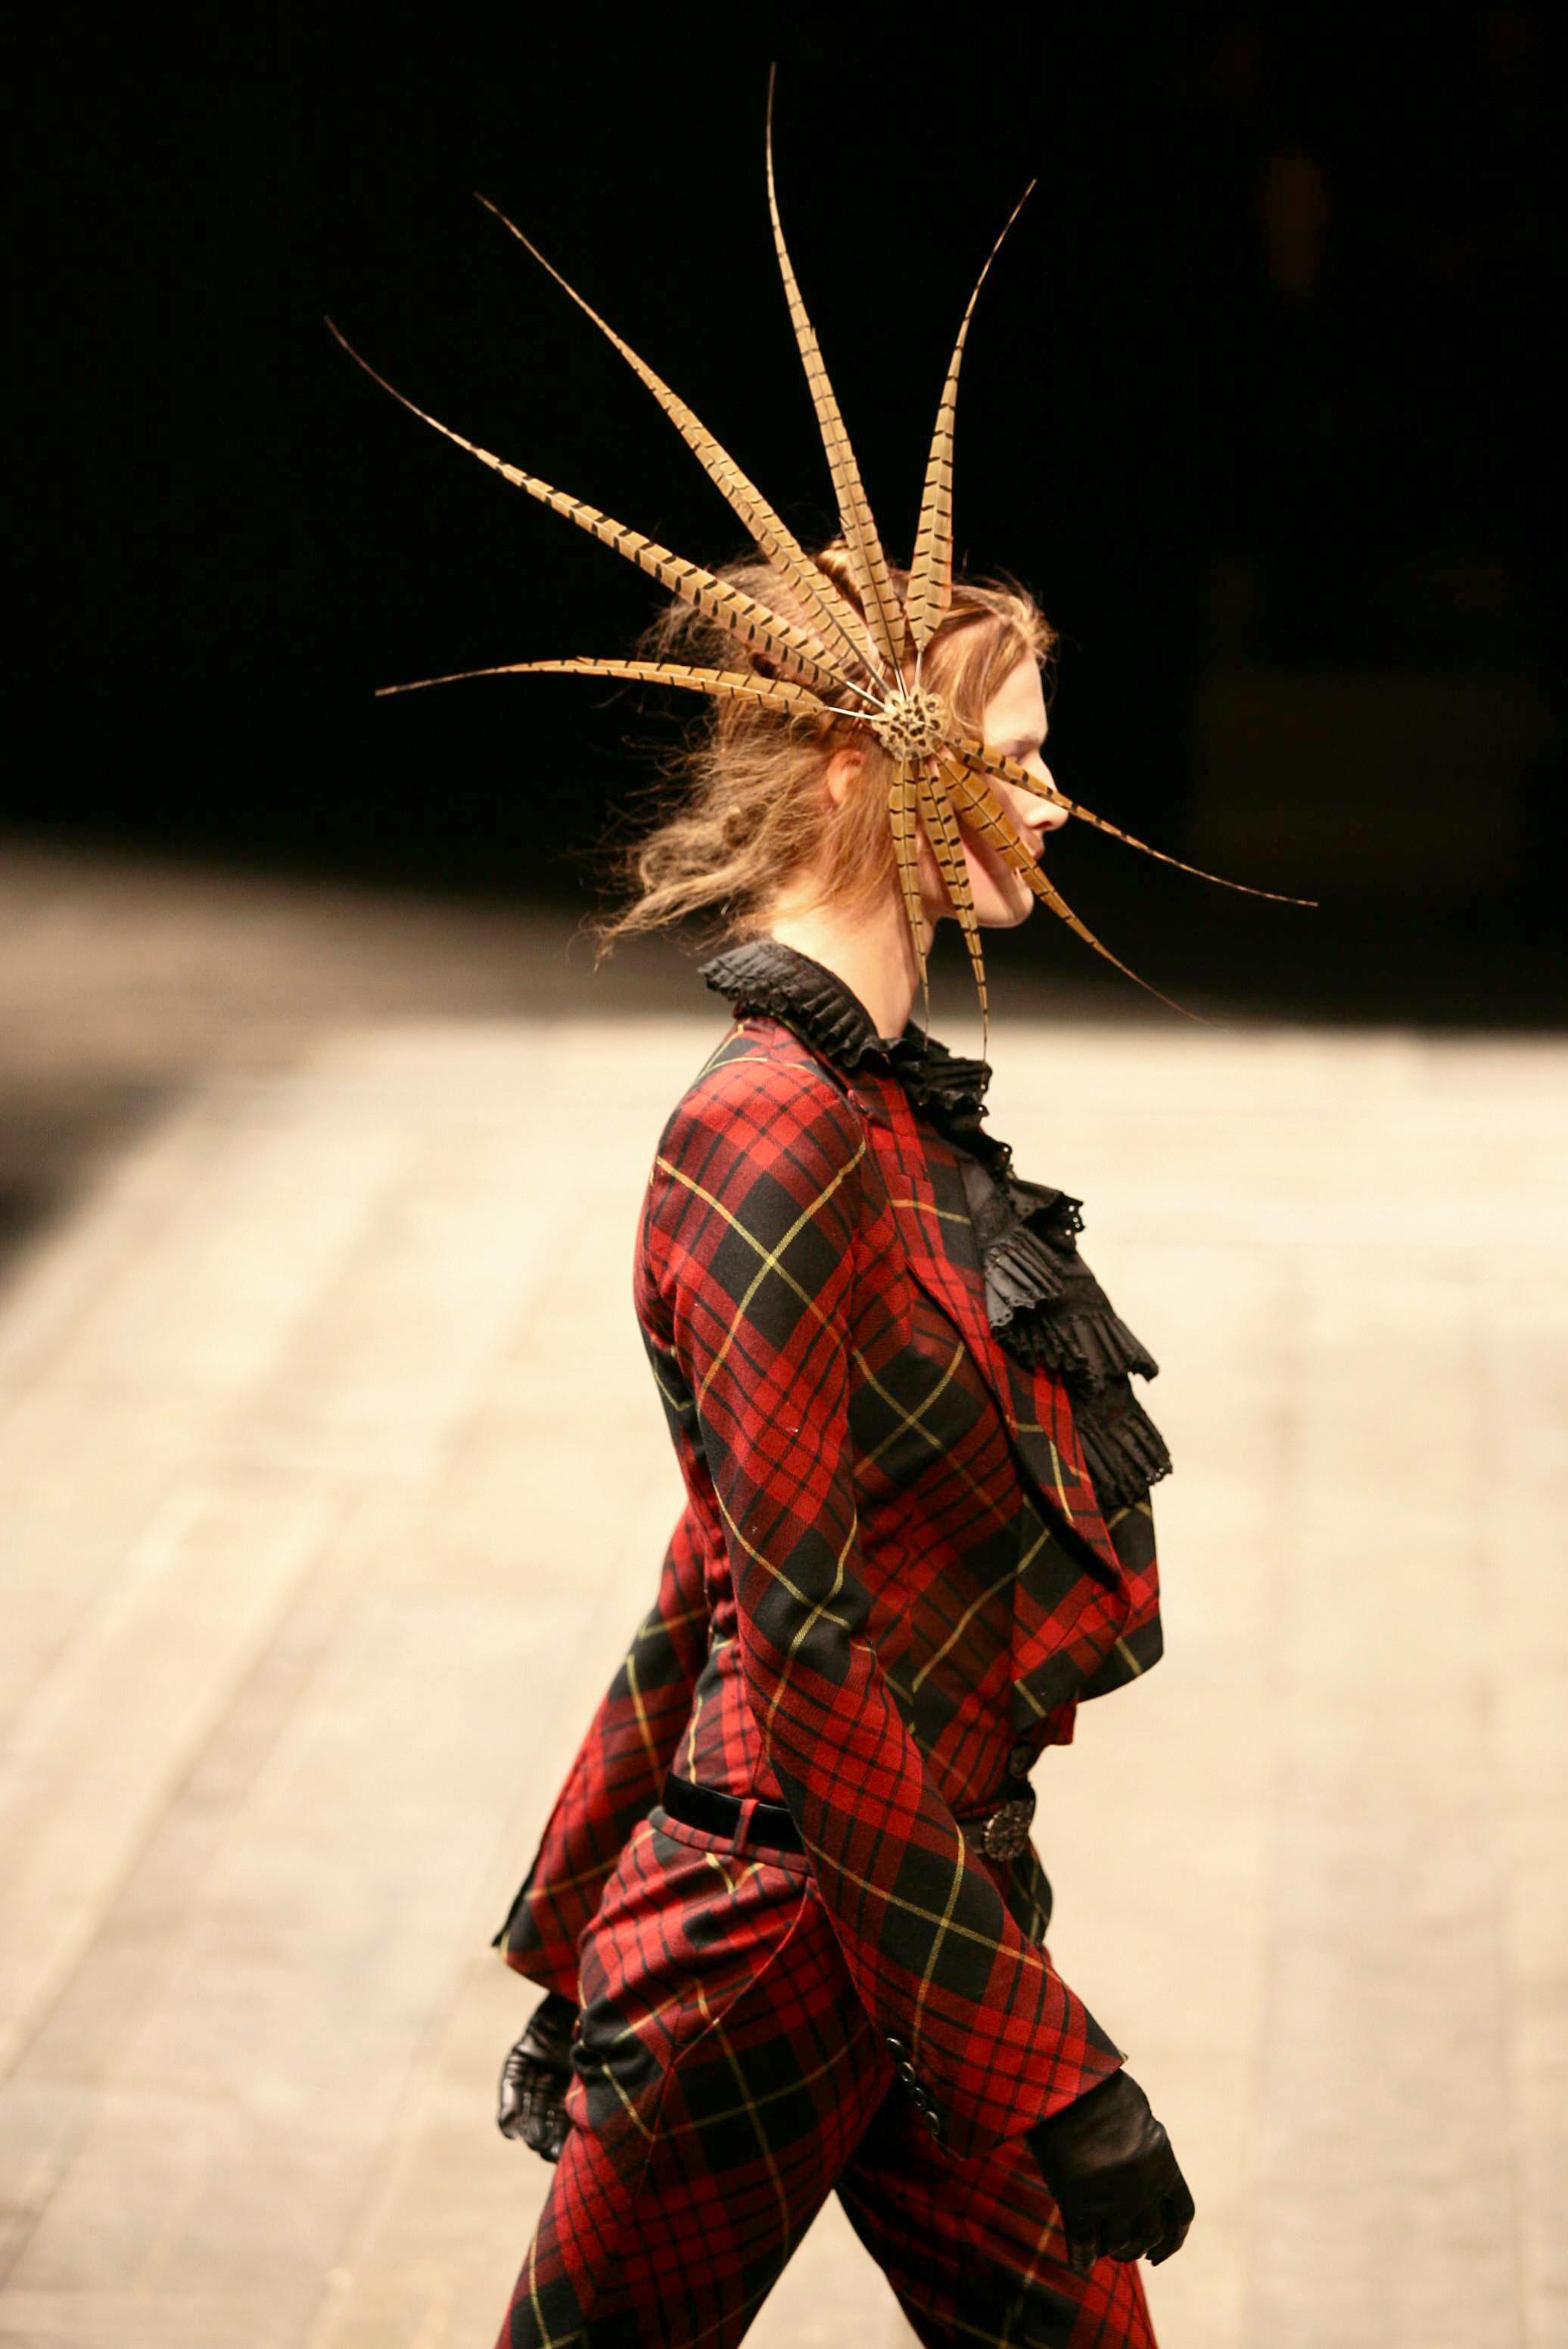 Alexander McQueen's fall 2006 runway show